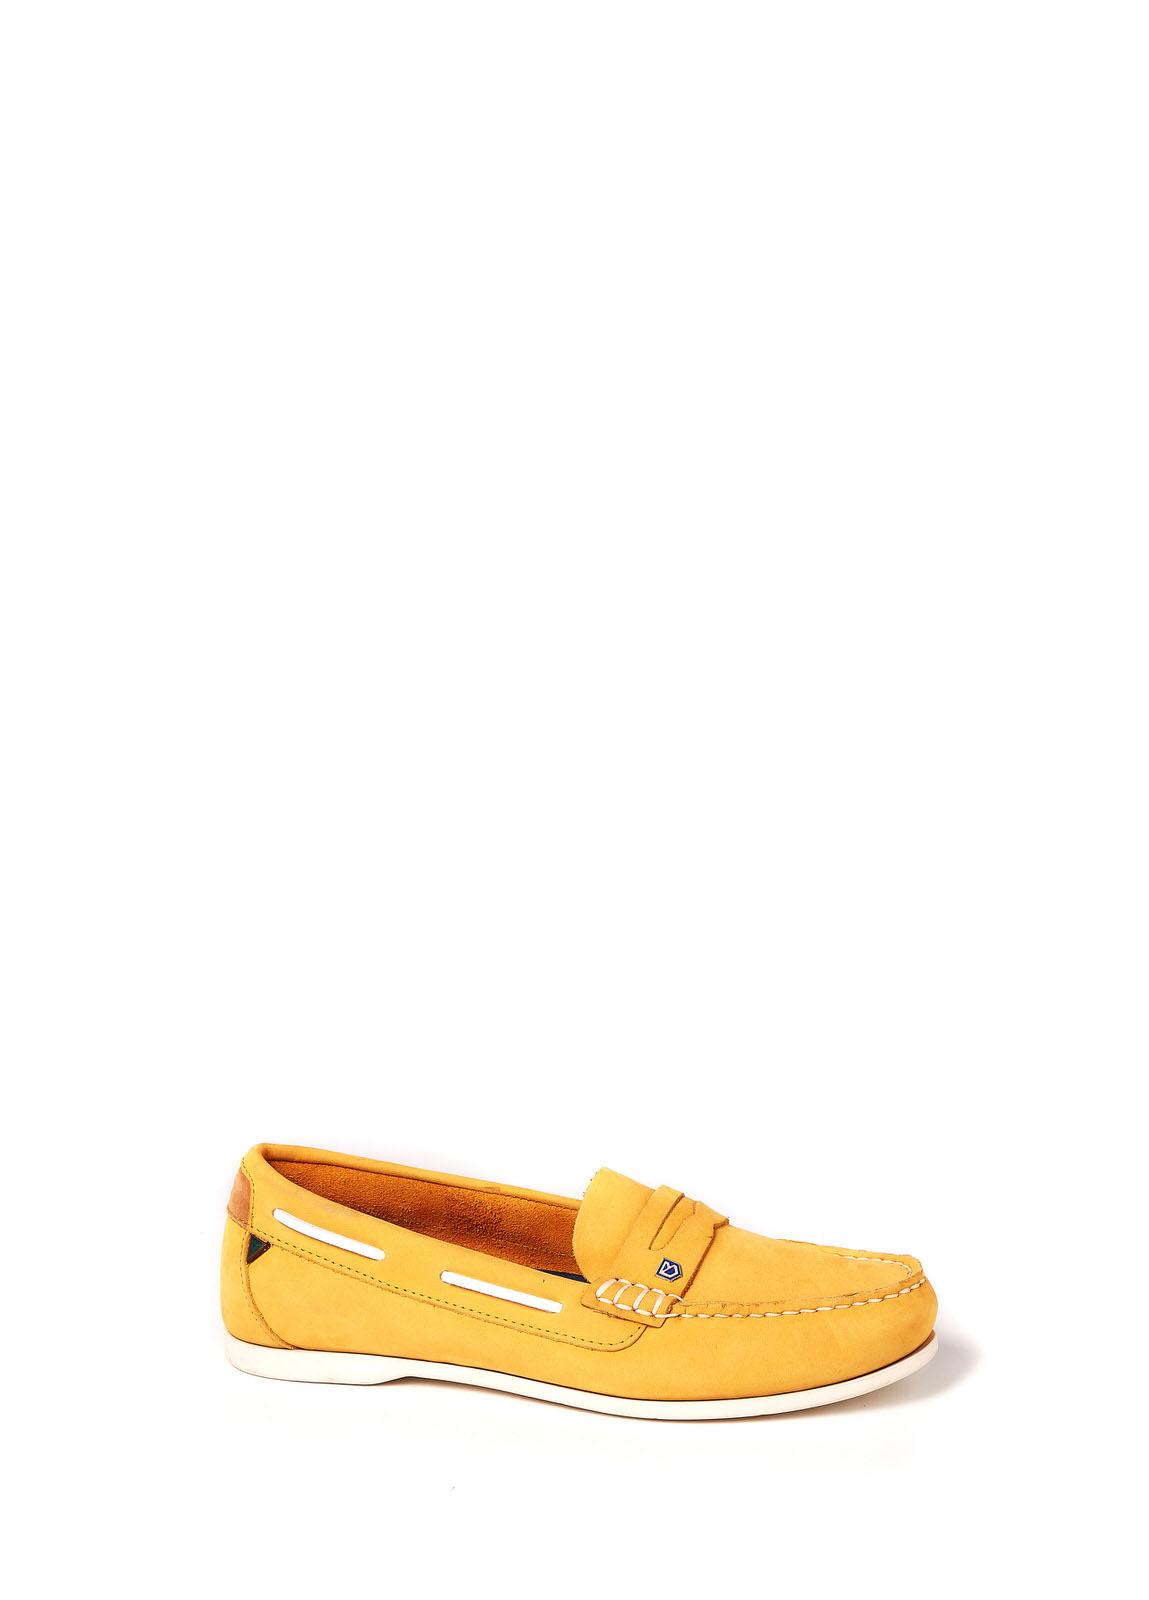 Dubarry_Belize Deck Shoe - Sunflower_Image_1